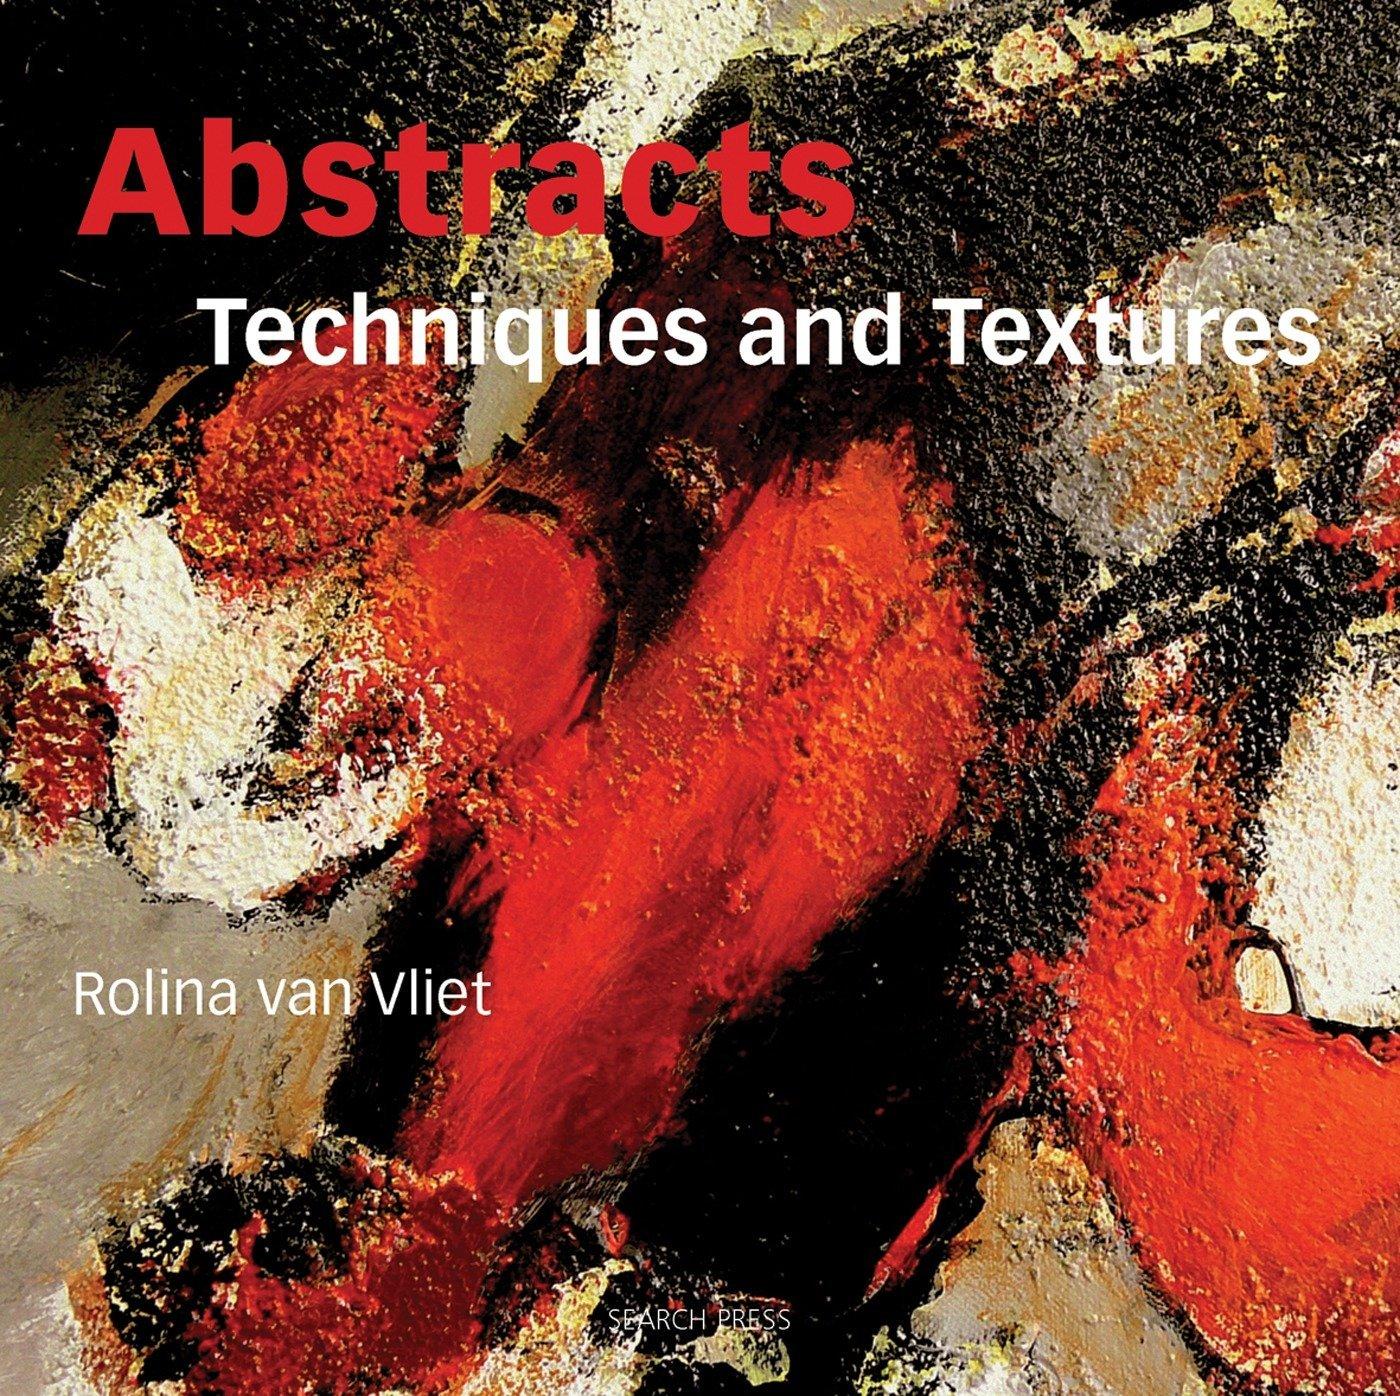 Abstracts Techniques And Textures Van Vliet Rolina 8601404622885 Amazon Com Books